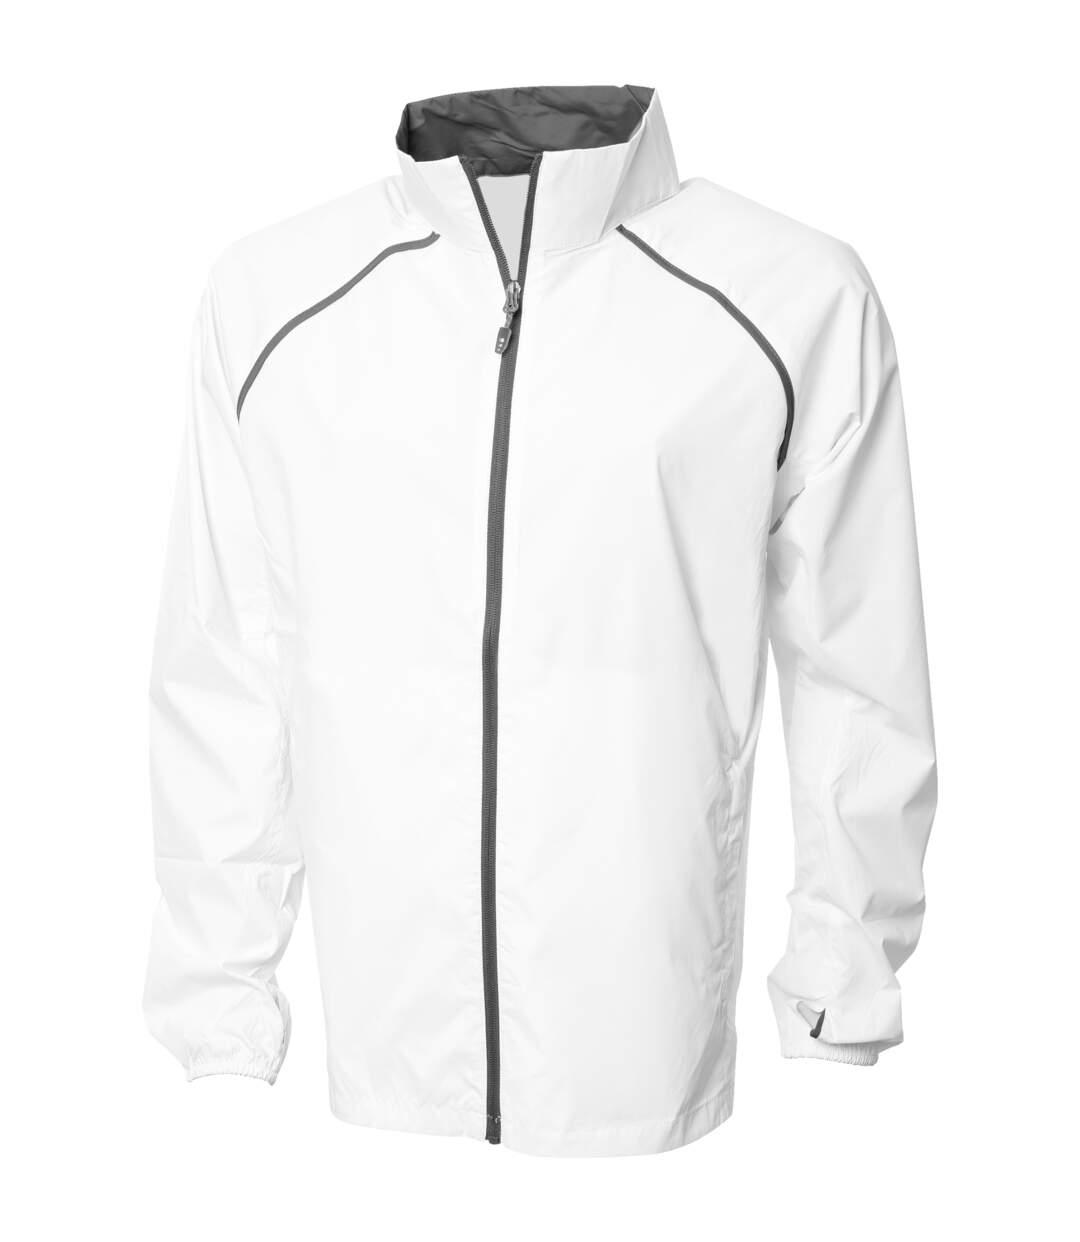 Elevate Mens Egmont Packable Jacket (White) - UTPF1862